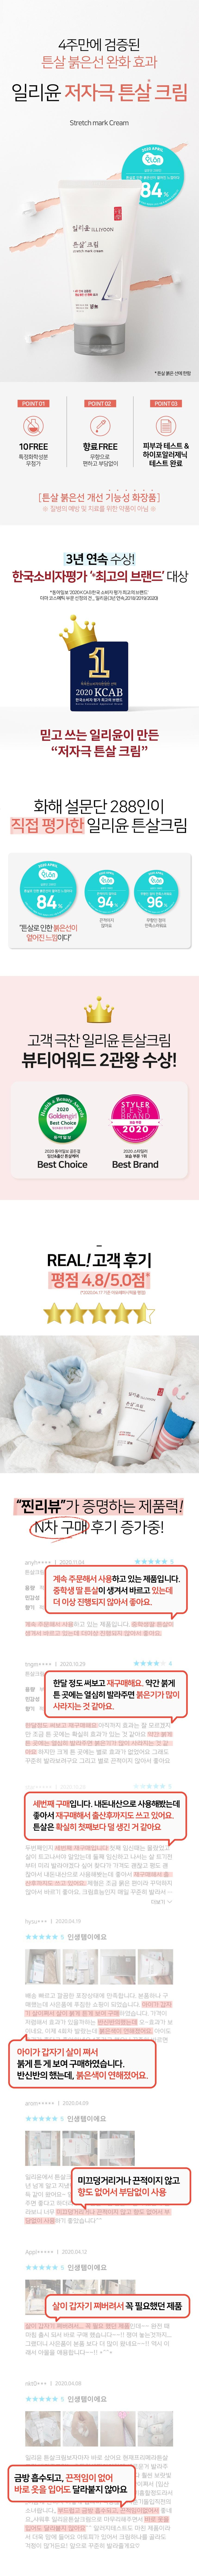 ILLIYOON Stretch Mark Cream korean cosmetic skincare product online shop malaysia China india1